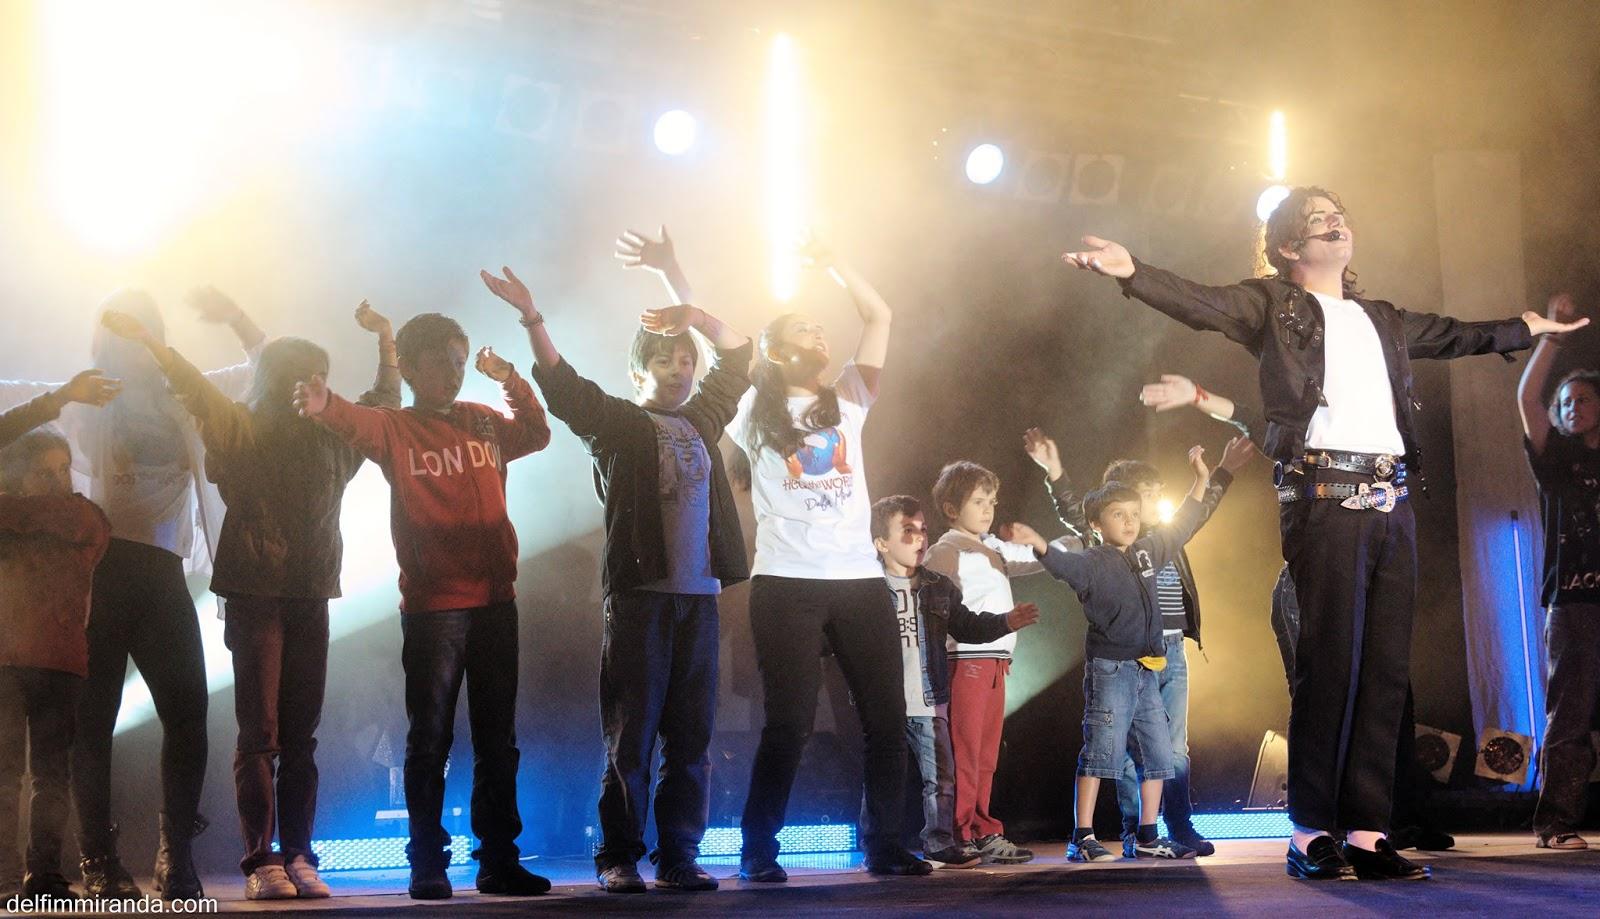 Delfim Miranda - Michael Jackson Tribute - Heal the World - Live on Stage